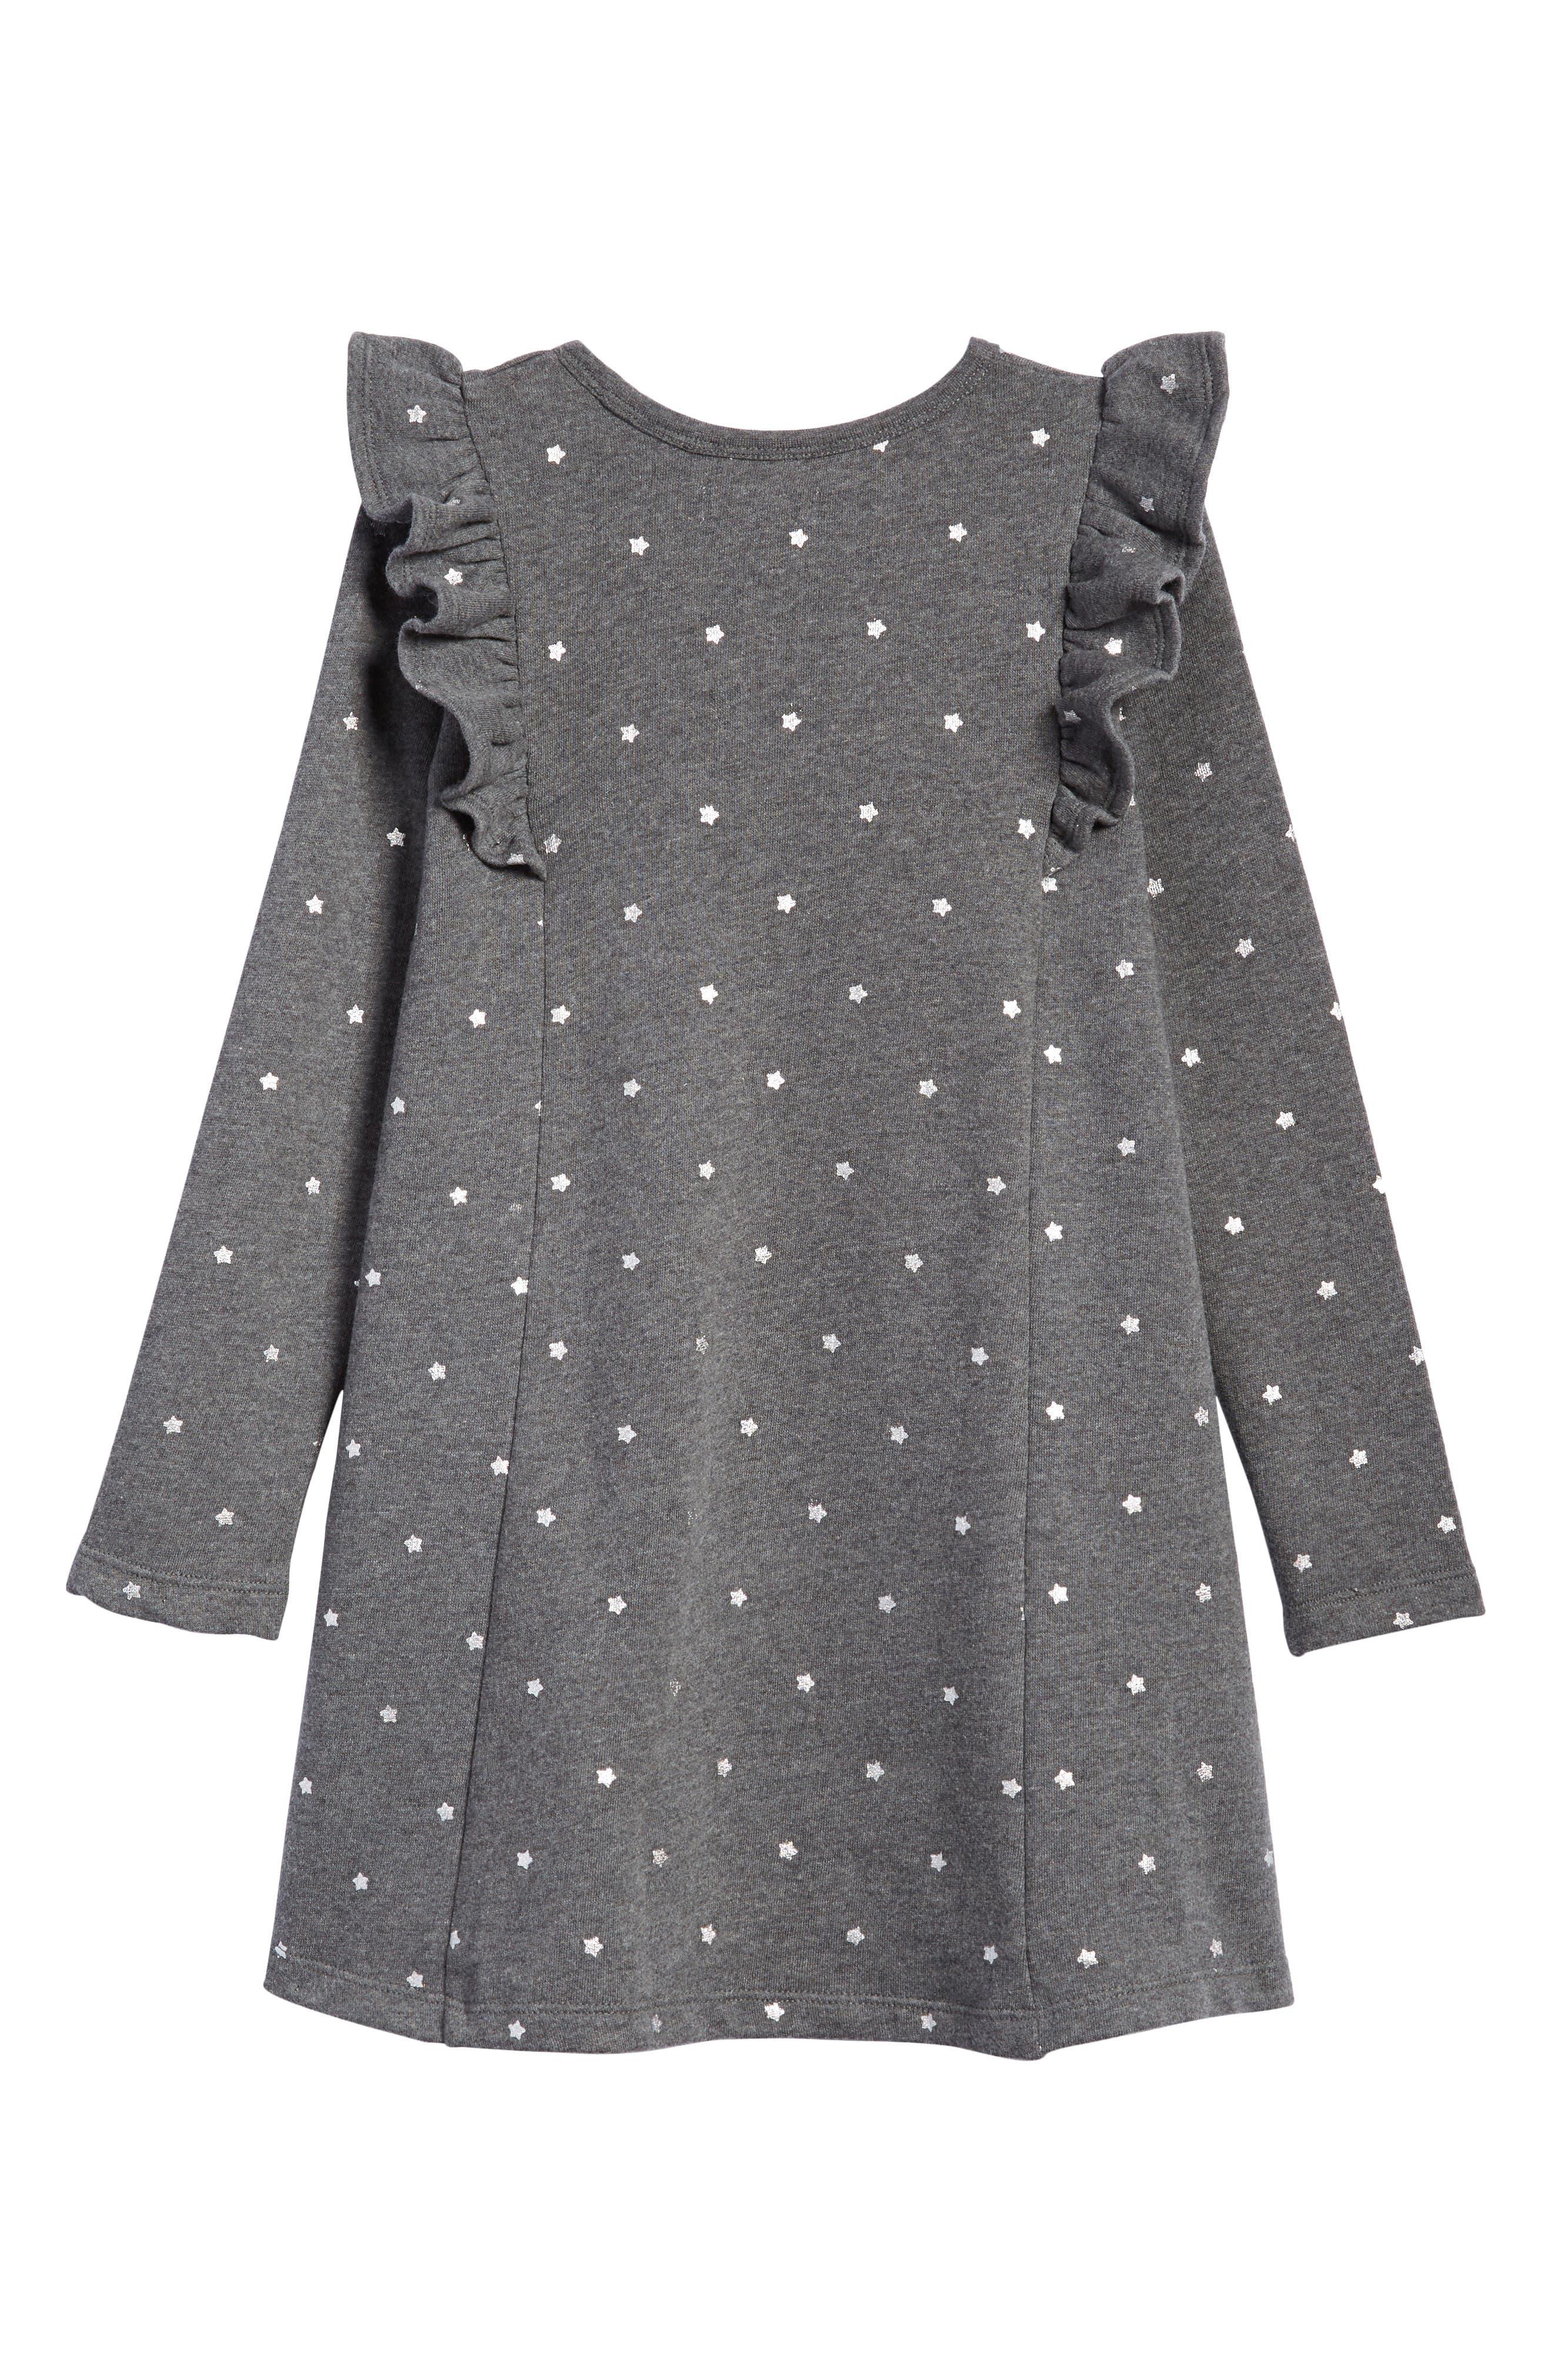 Ruffle Fleece Sweater Dress,                             Alternate thumbnail 2, color,                             GREY CHARCOAL HEATHER STARS